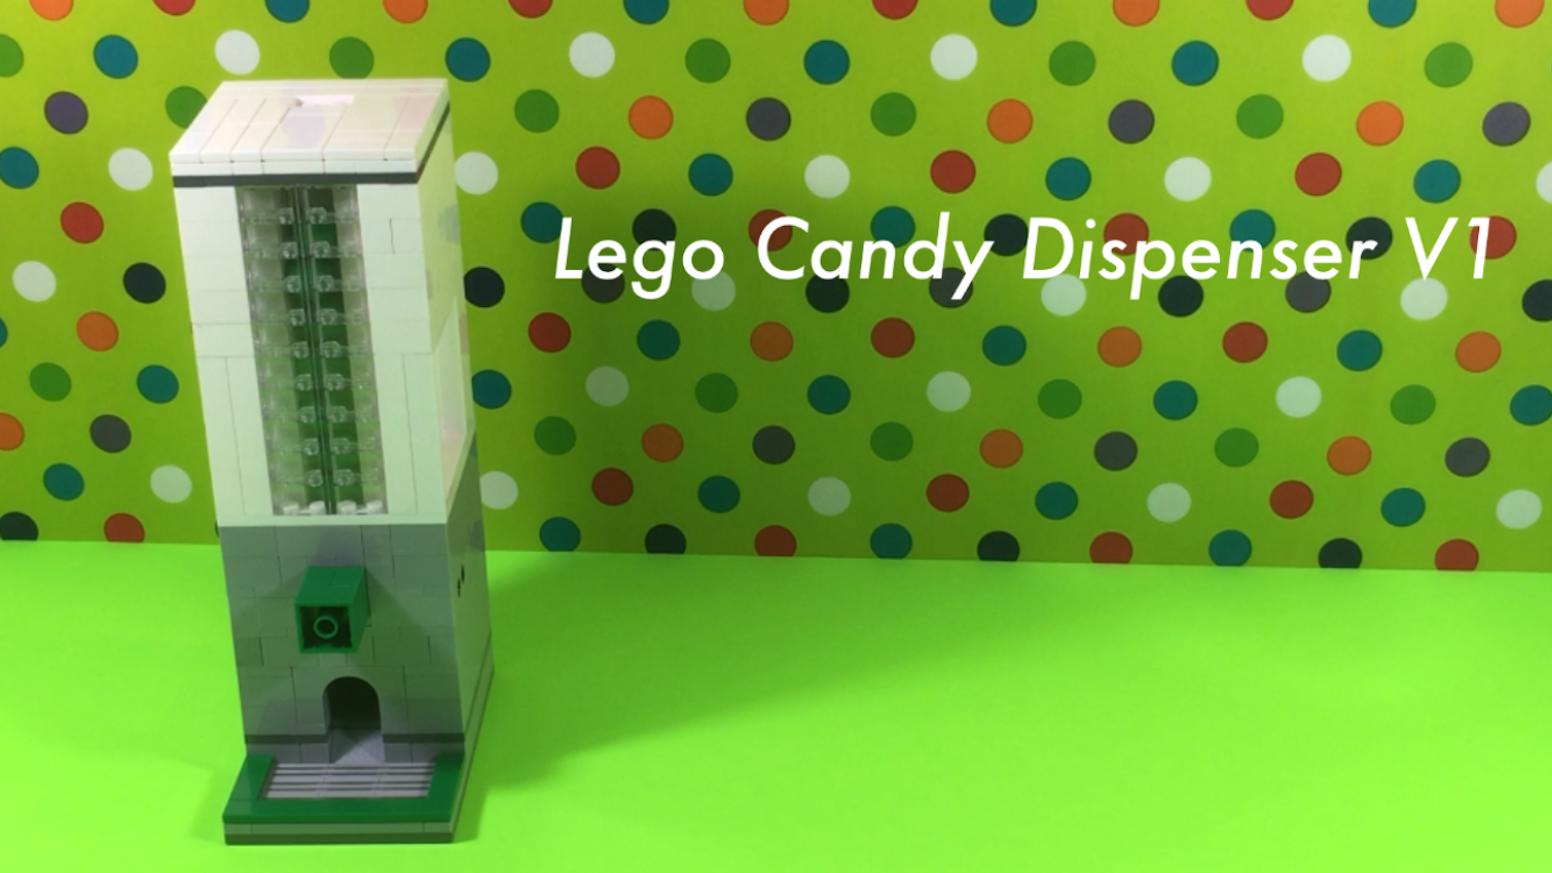 Lego Candy Dispenser V1 By Gaurav Dutta Kickstarter